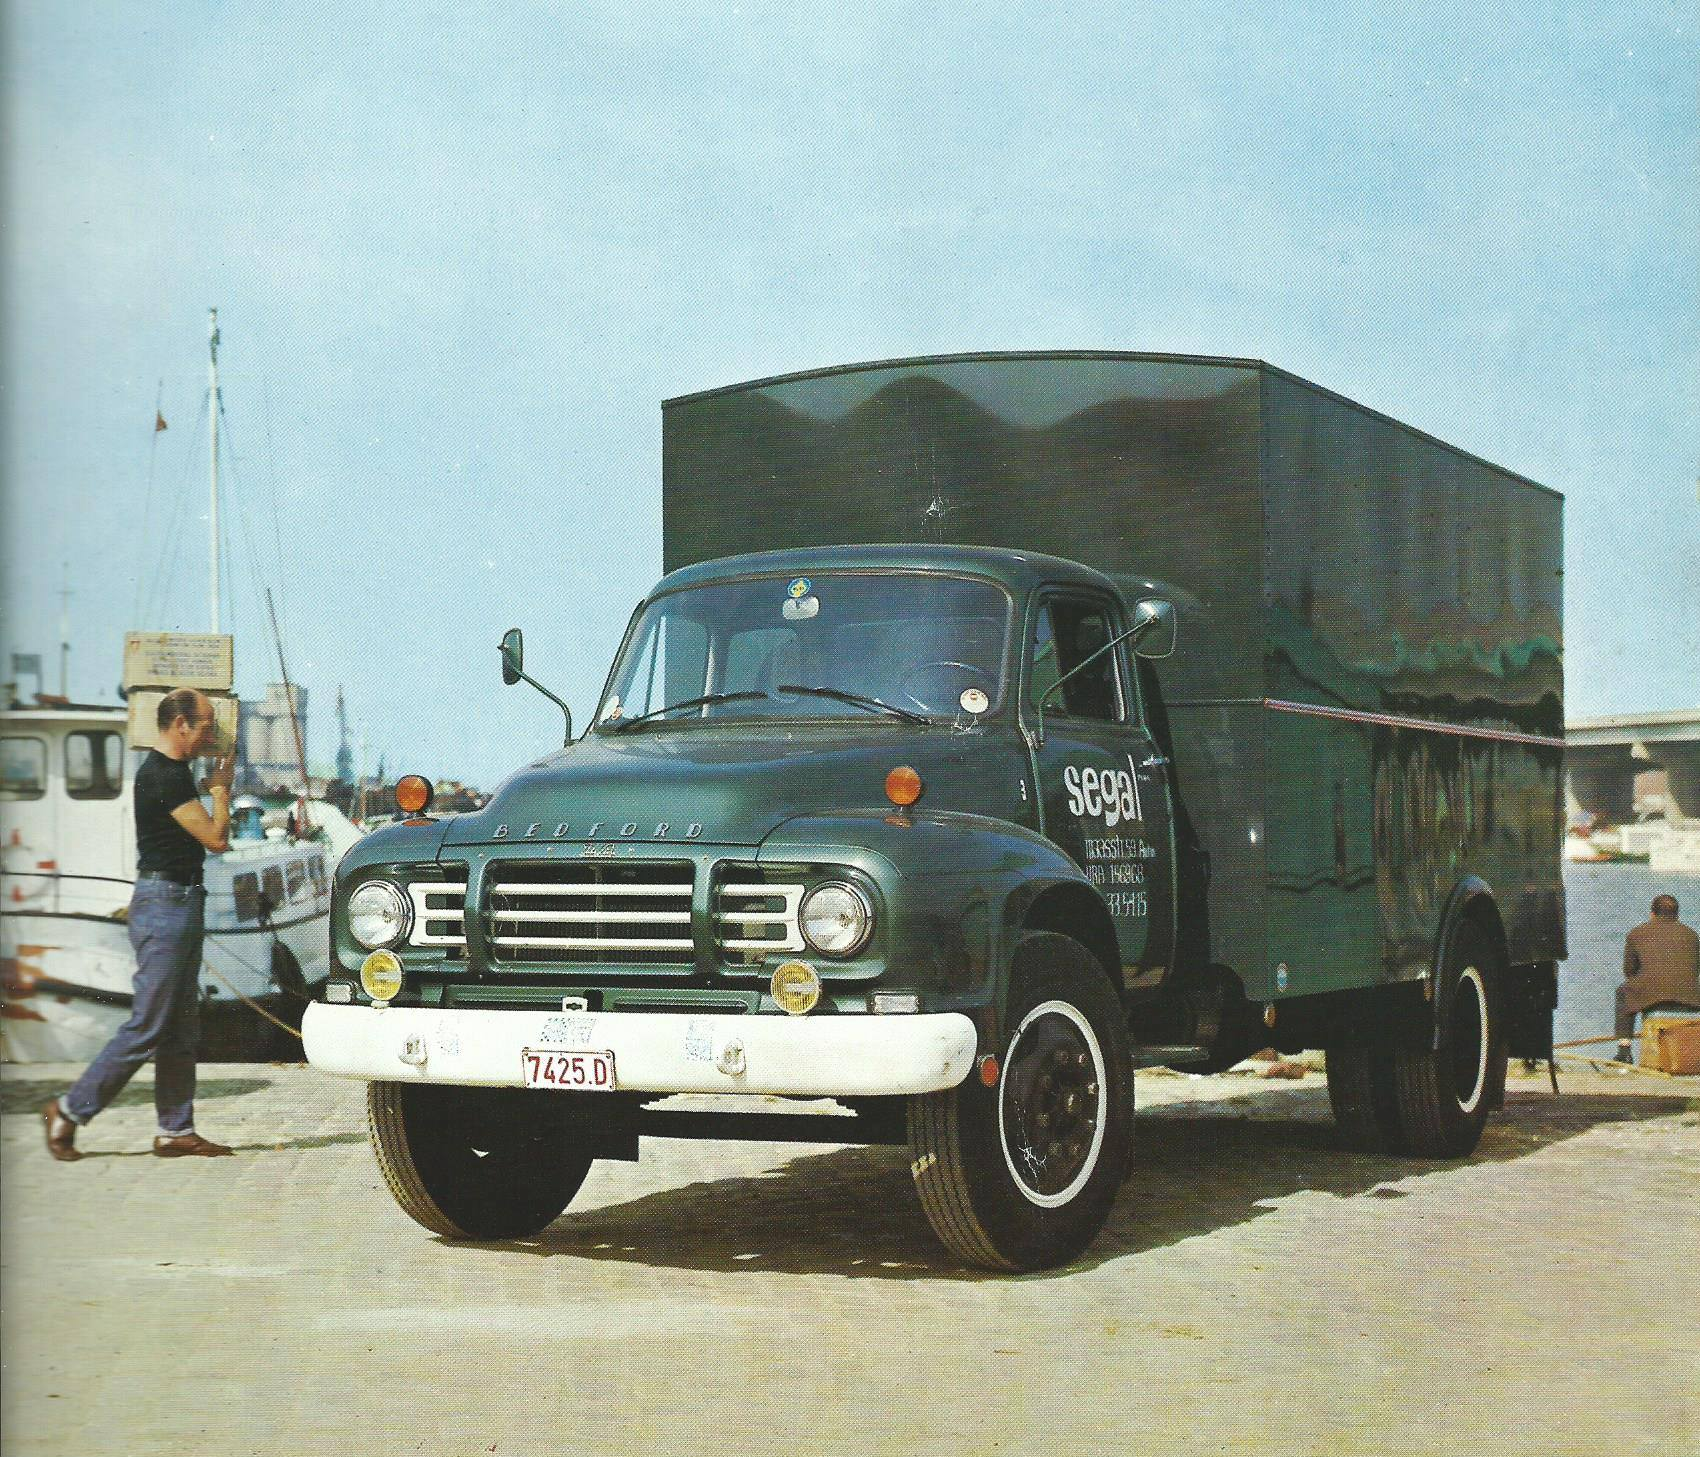 Bedford-serie--Roger-Verhaert-archief-4